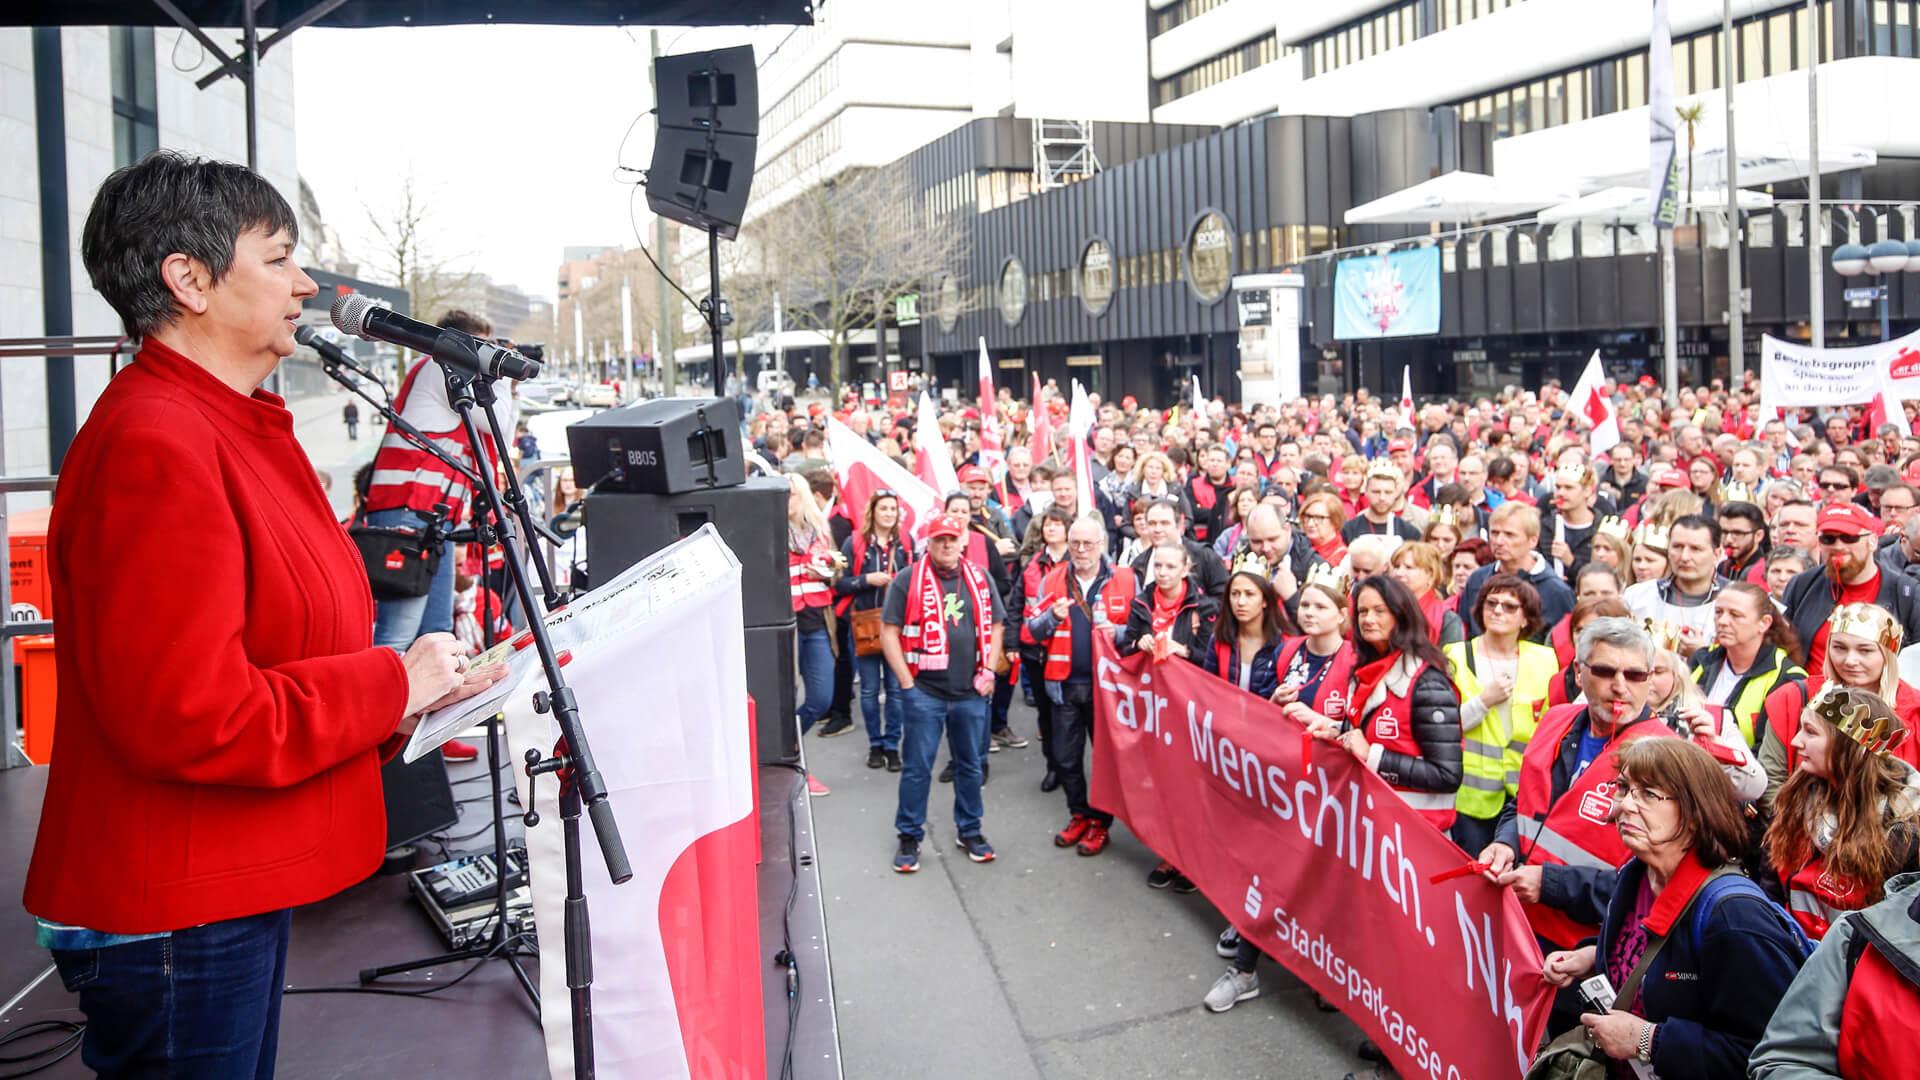 Verdi Streik | Eventfotografie